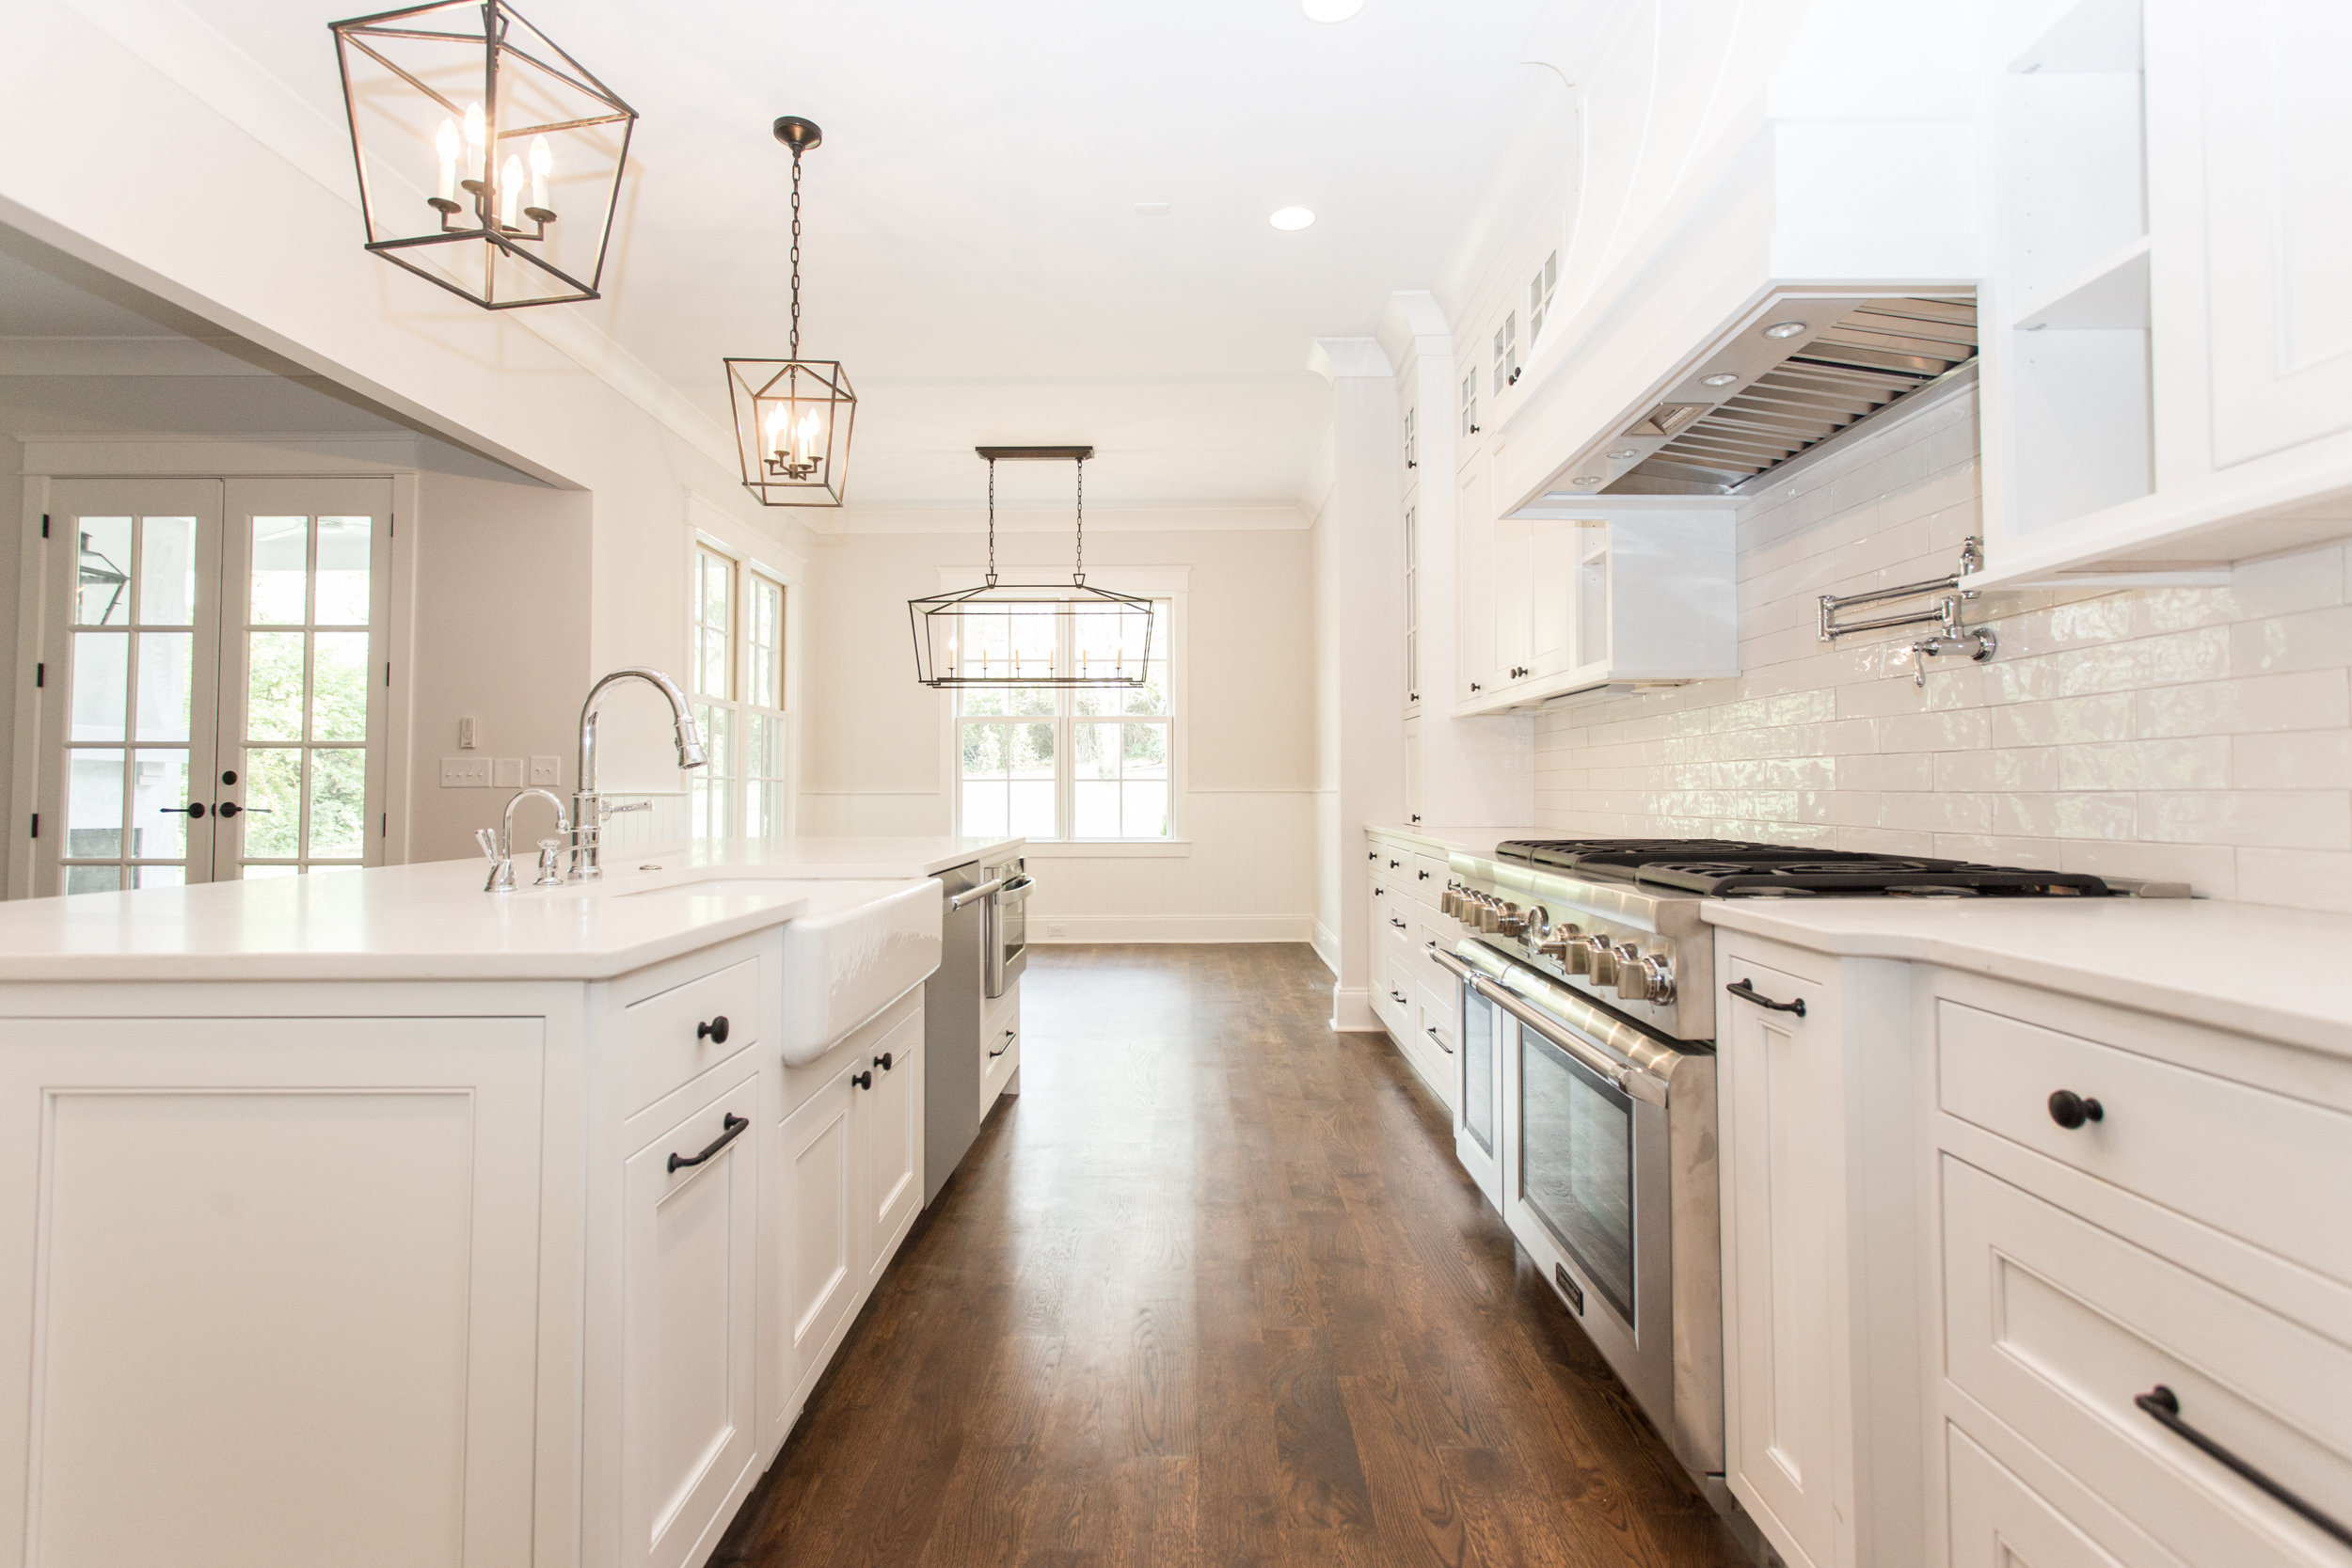 chandelier-development-custom-home-builder-belle-meade-tennessee-nashville-development-company-28.jpg